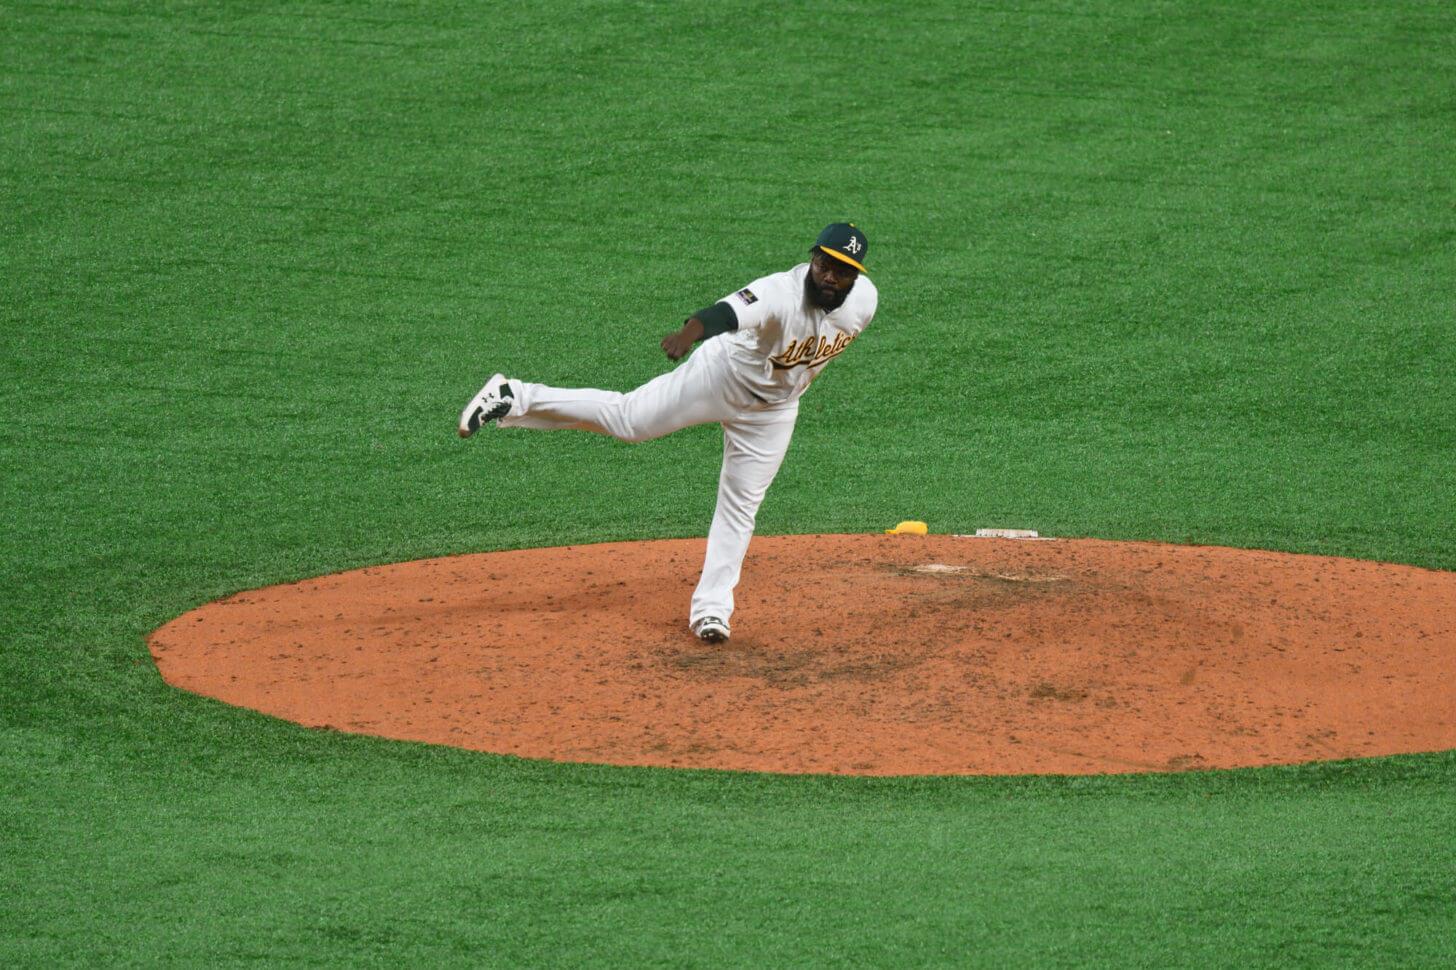 MLB日本開幕戦でのフェルナンド・ロドニー